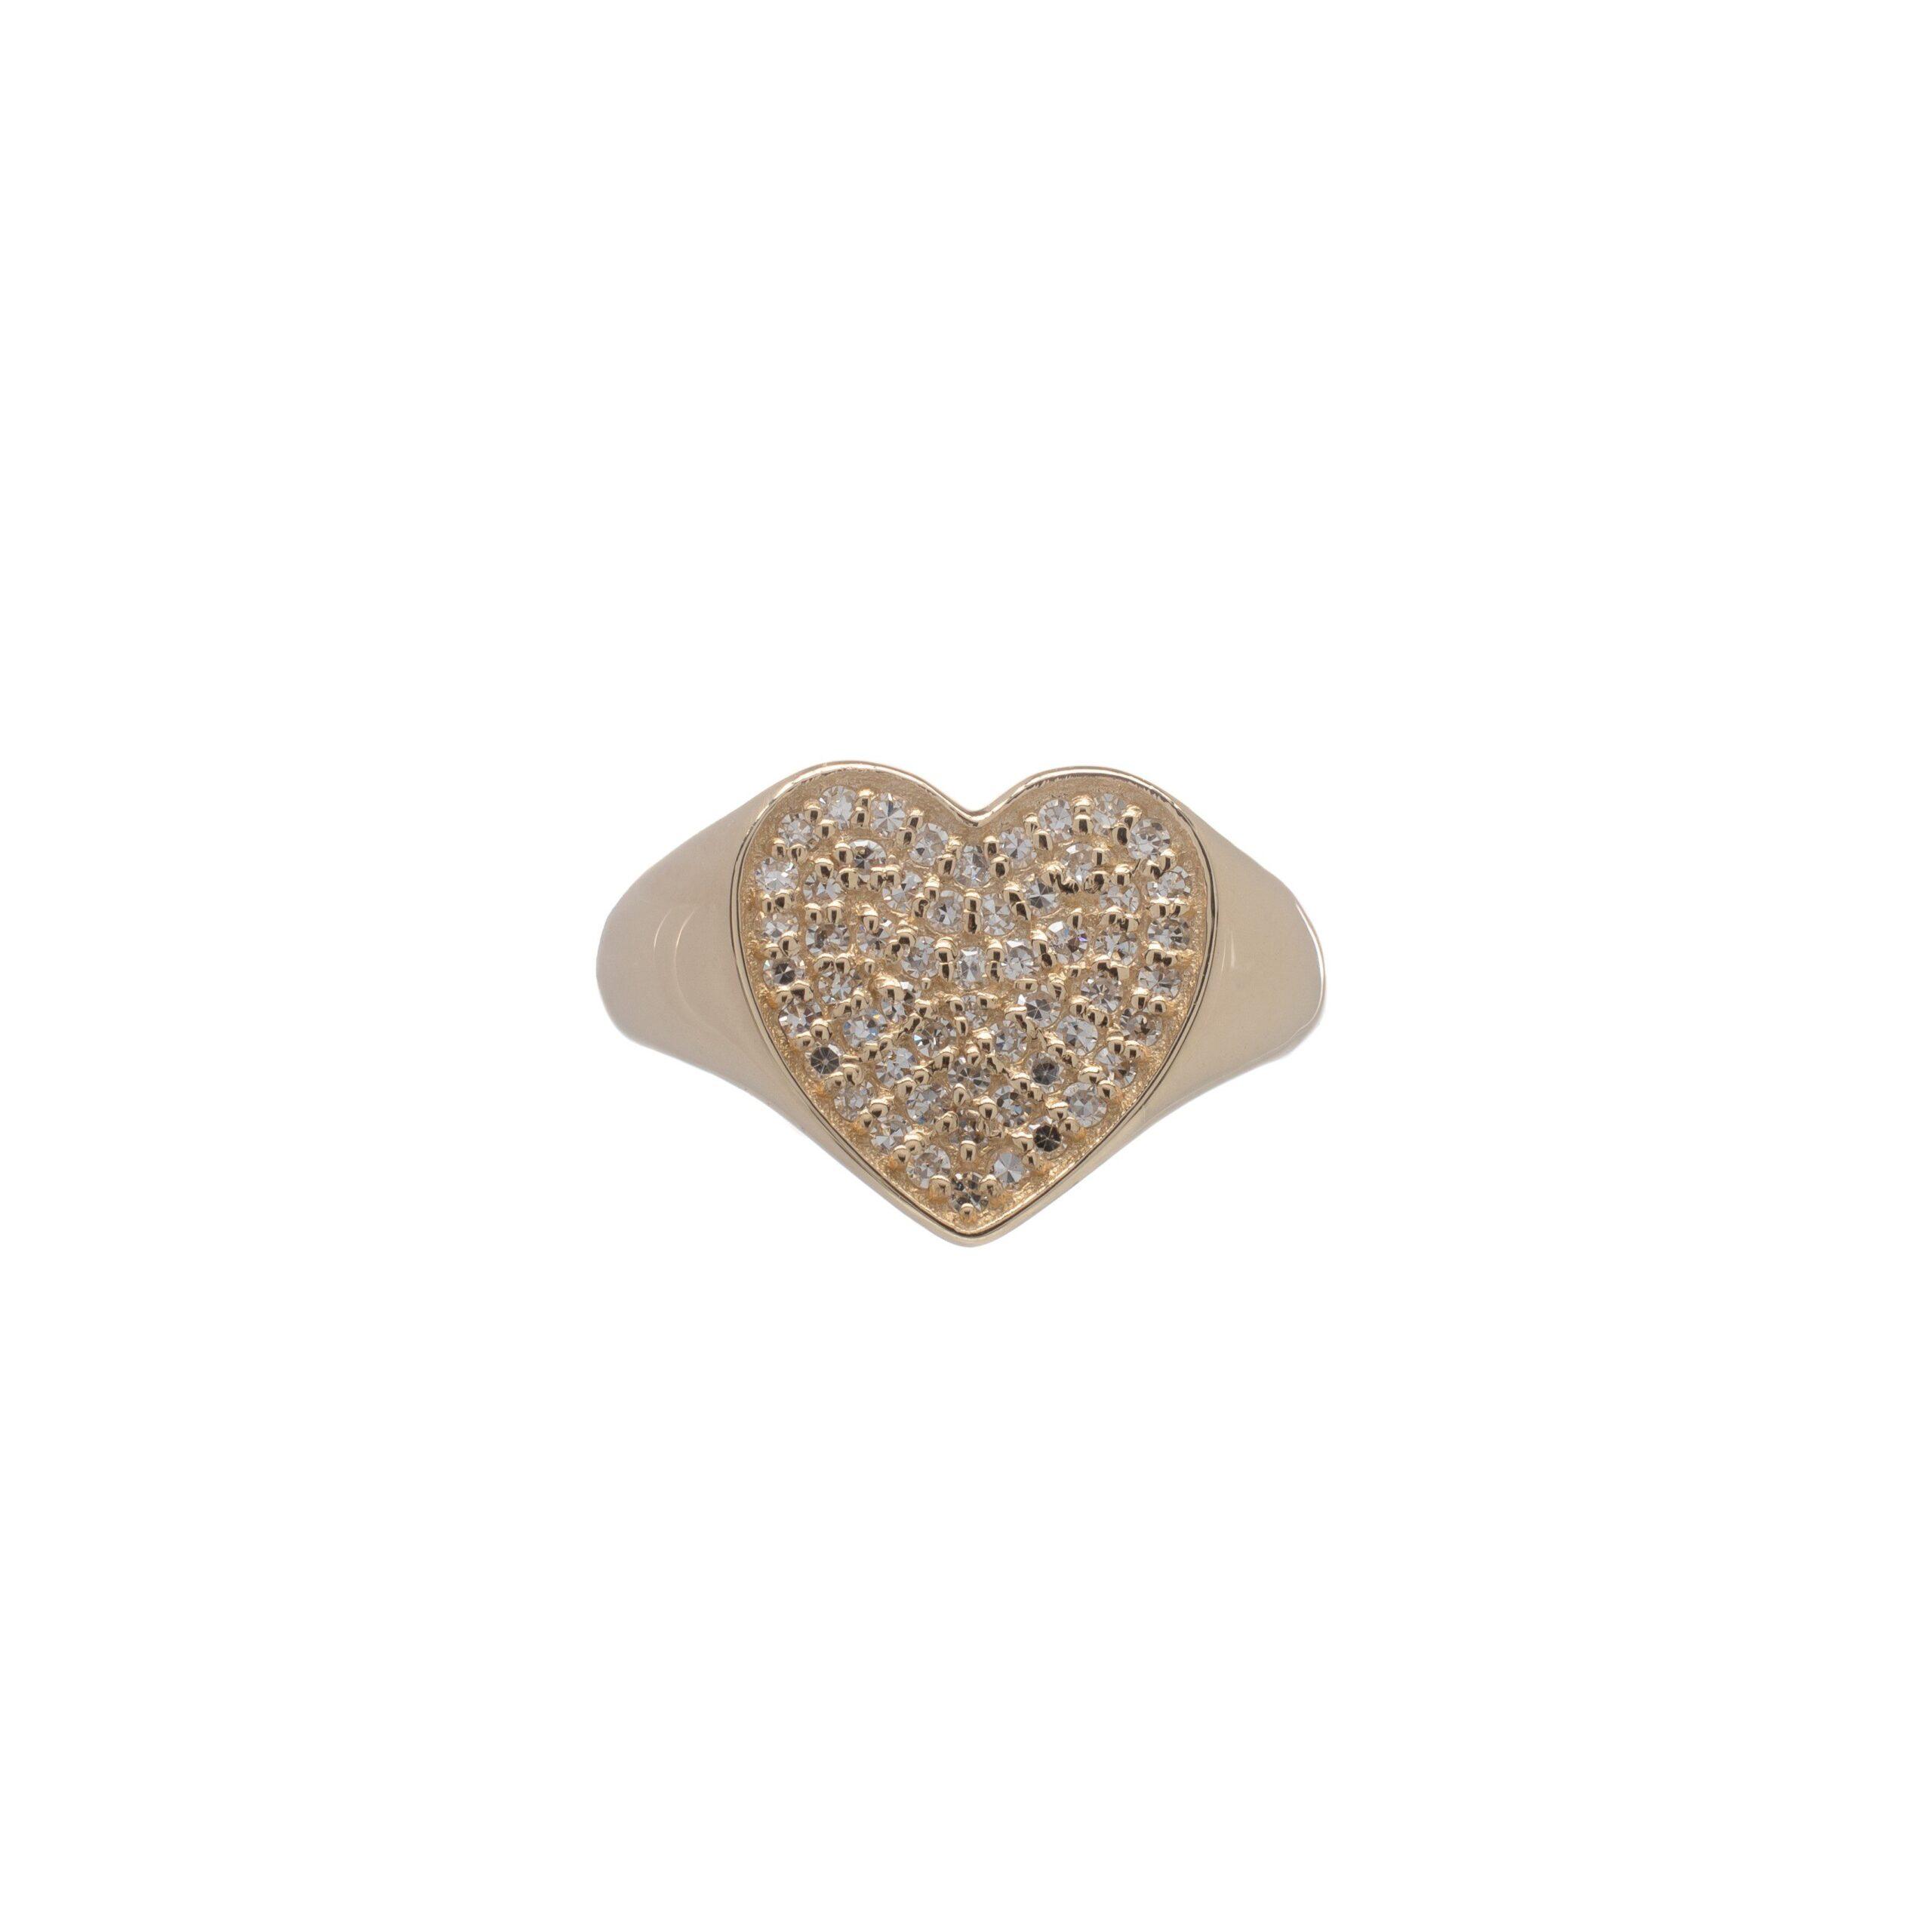 Diamond Heart Signet Pinky Ring Yellow Gold